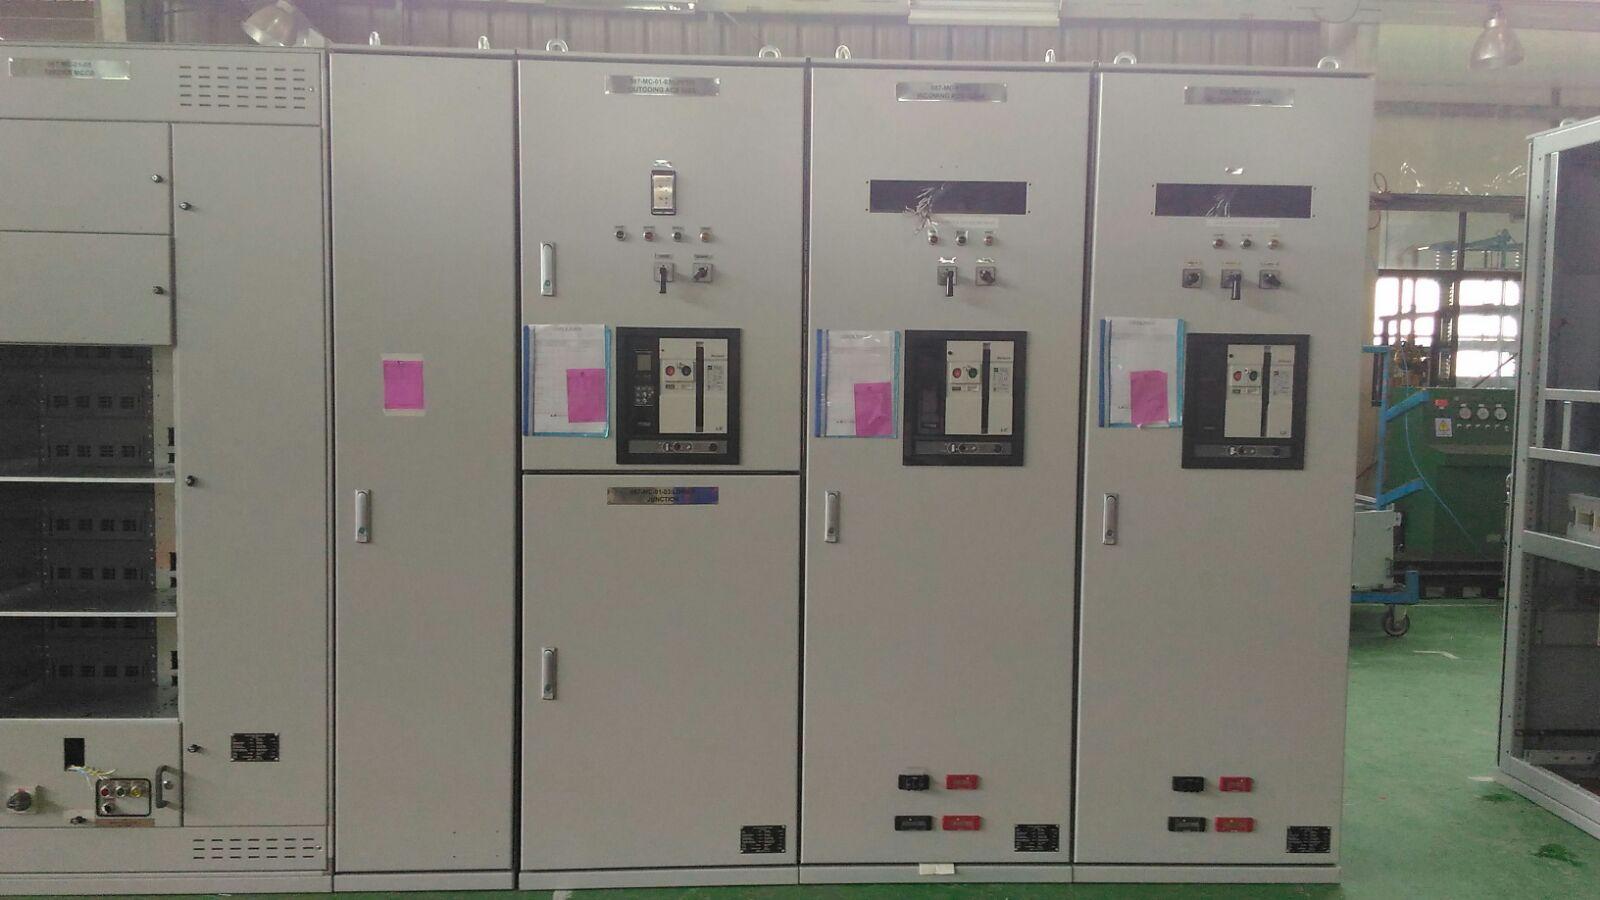 mcc switchgear - photo #28